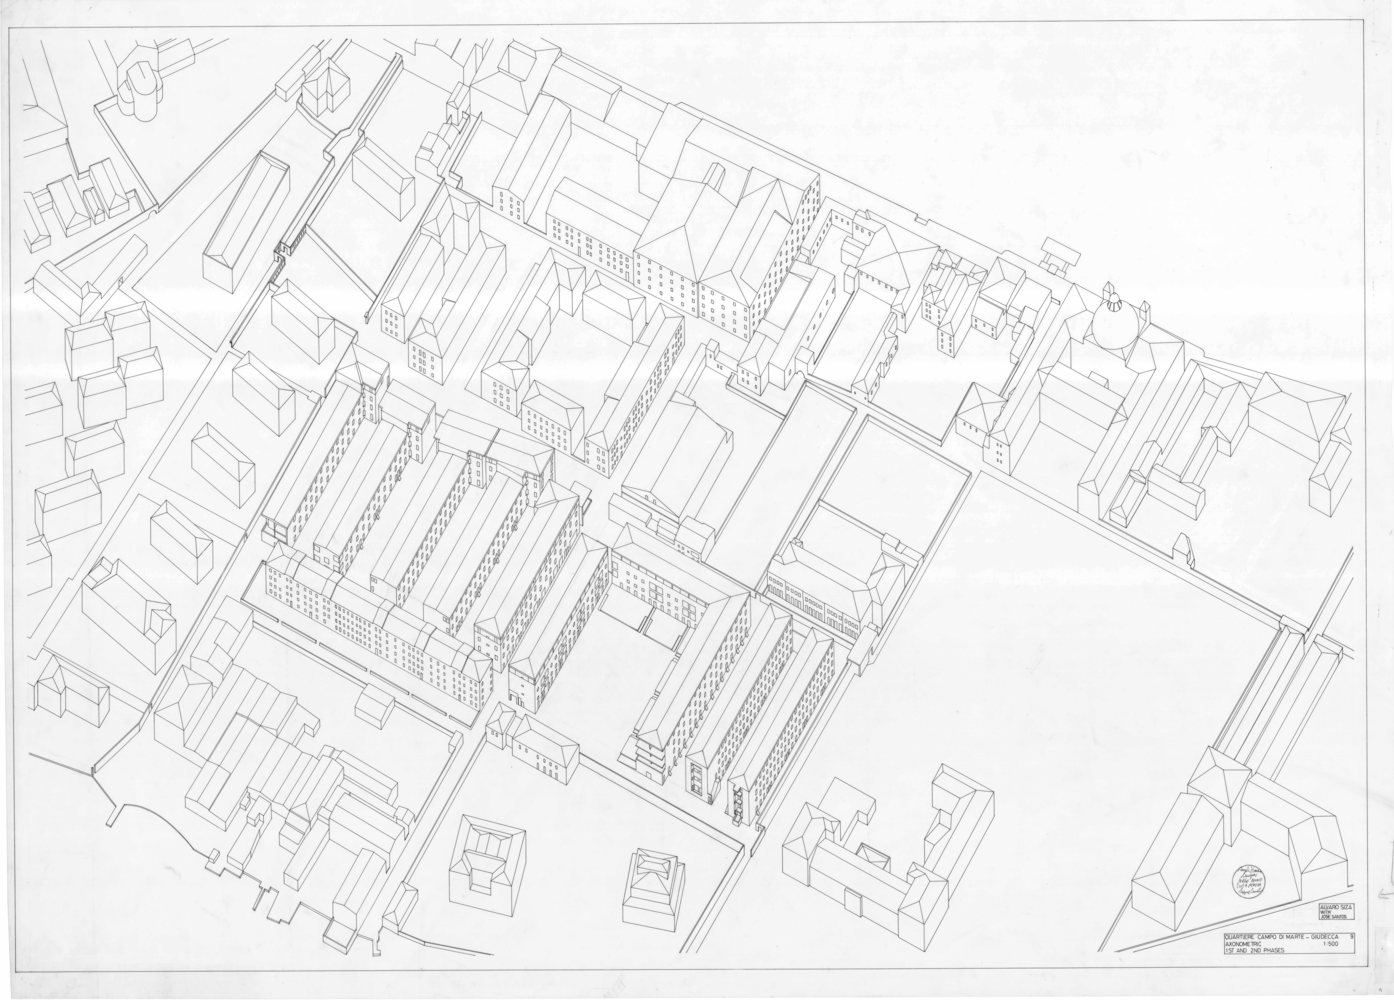 Gallery Of NEIGHBOURHOOD Where Alvaro Meets Aldo The - Venice biennale 2016 map